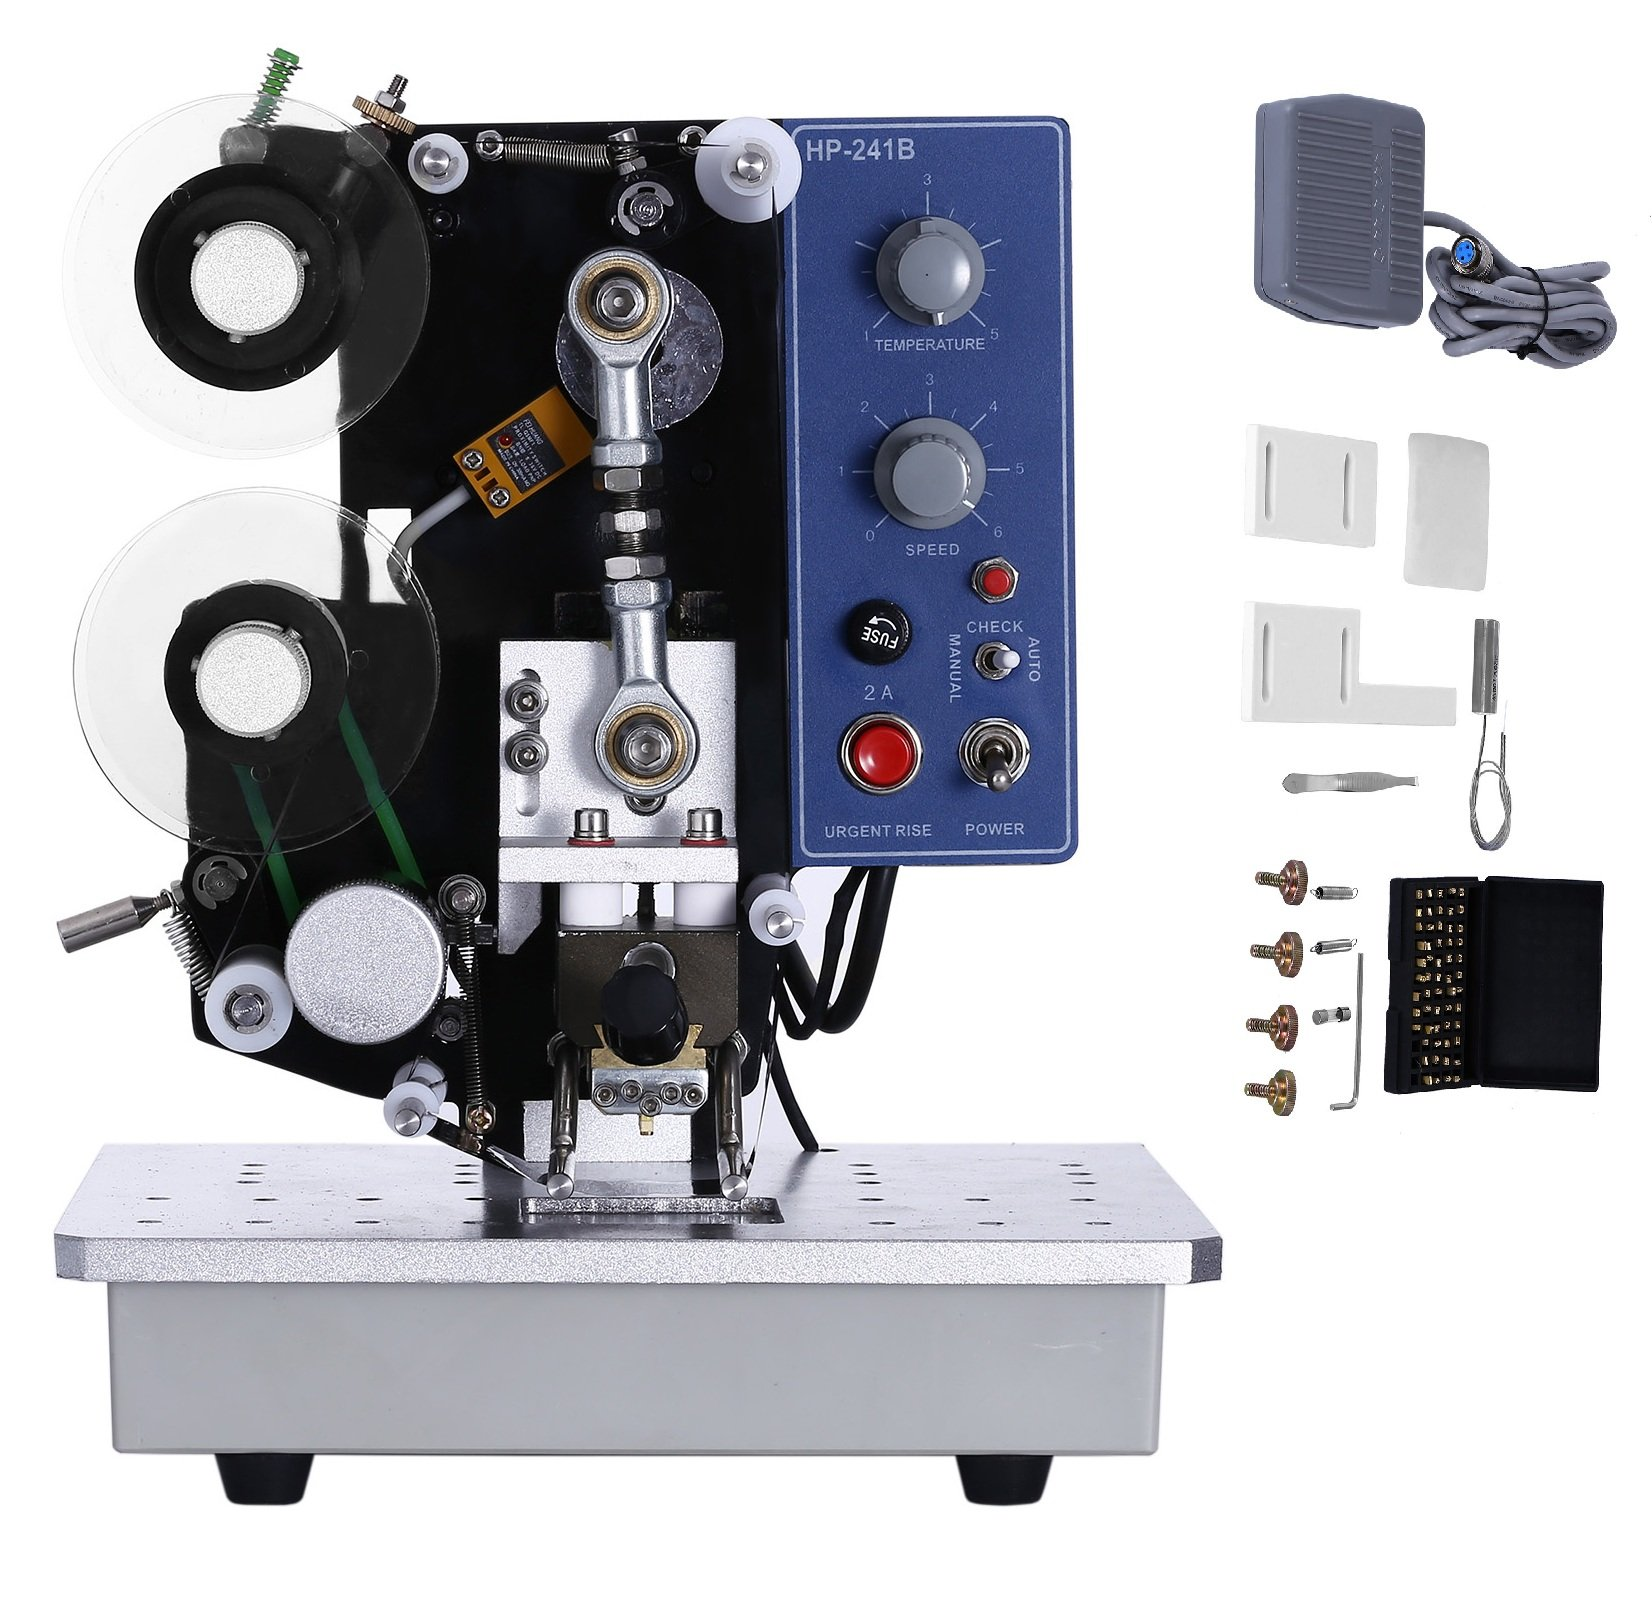 Superland HP-241B Semi-Automatic Electric Ribbon Coding Machine 200W Thermal Foil Stamp Printer 10~100times/min Foil Printing Machine 110V (HP-241B) by Superland